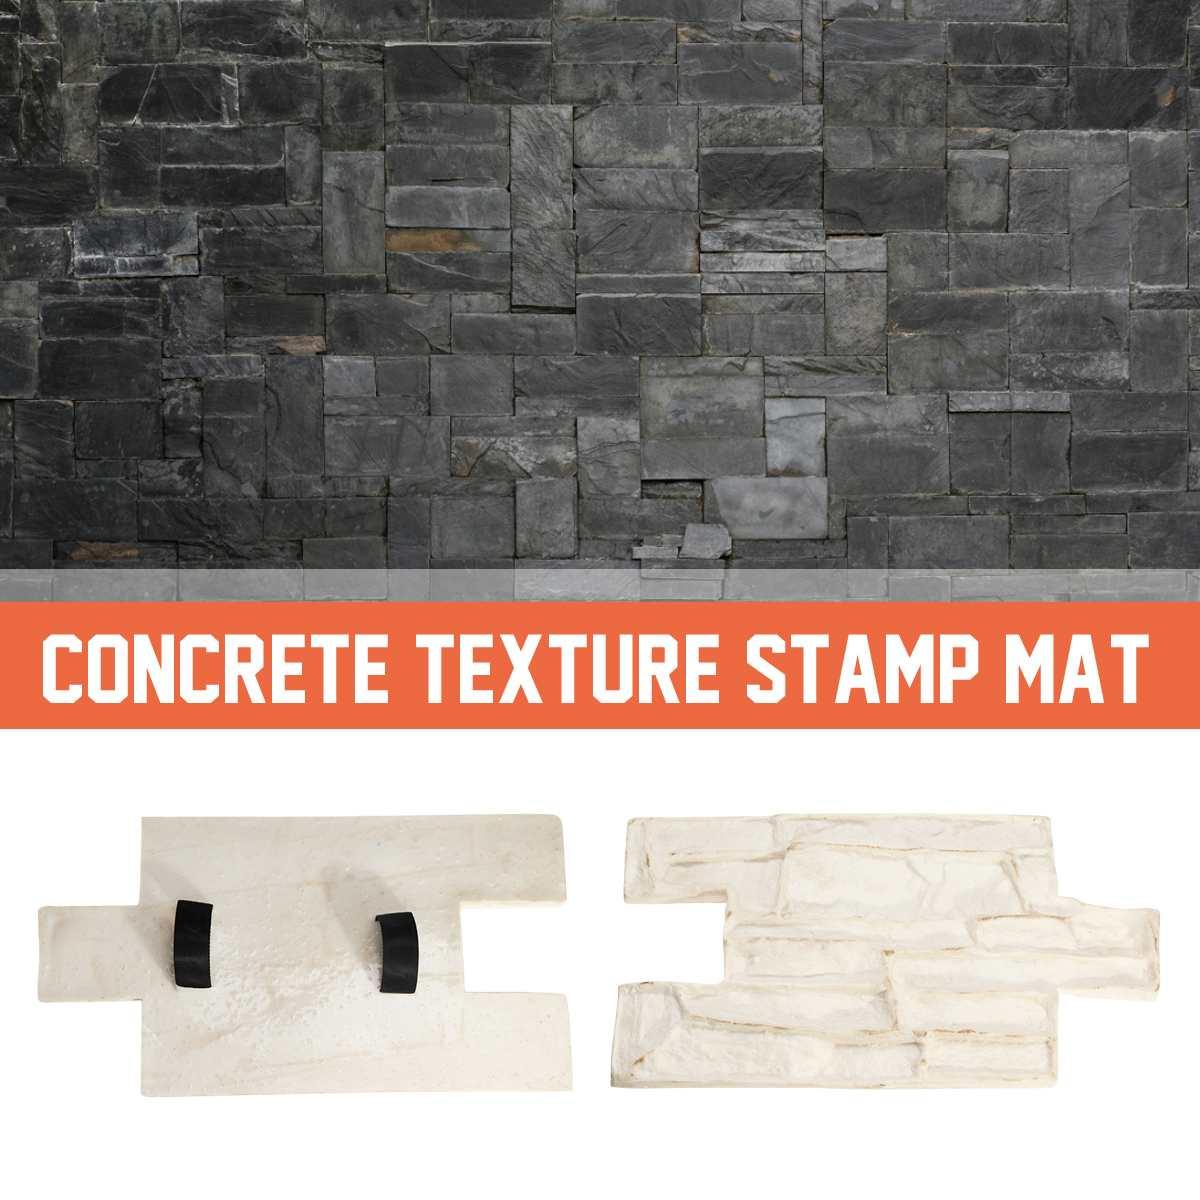 Garden House Decor Texture Wall  Floors Molds Polyurethane Molds For Concrete Cement Plaster Stamps Model Molds Rubber Molds